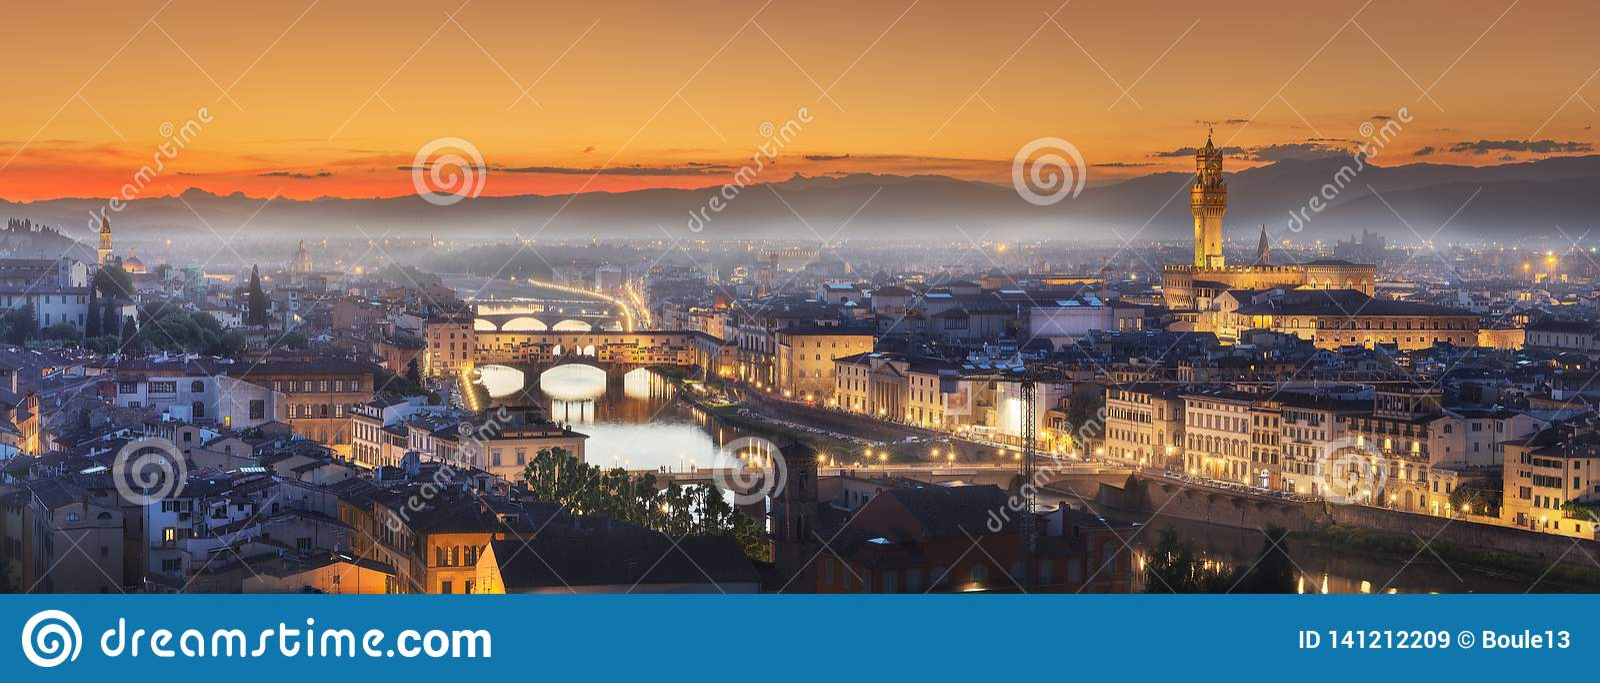 Arno River en bruggen bij zonsondergang Florence, Italië